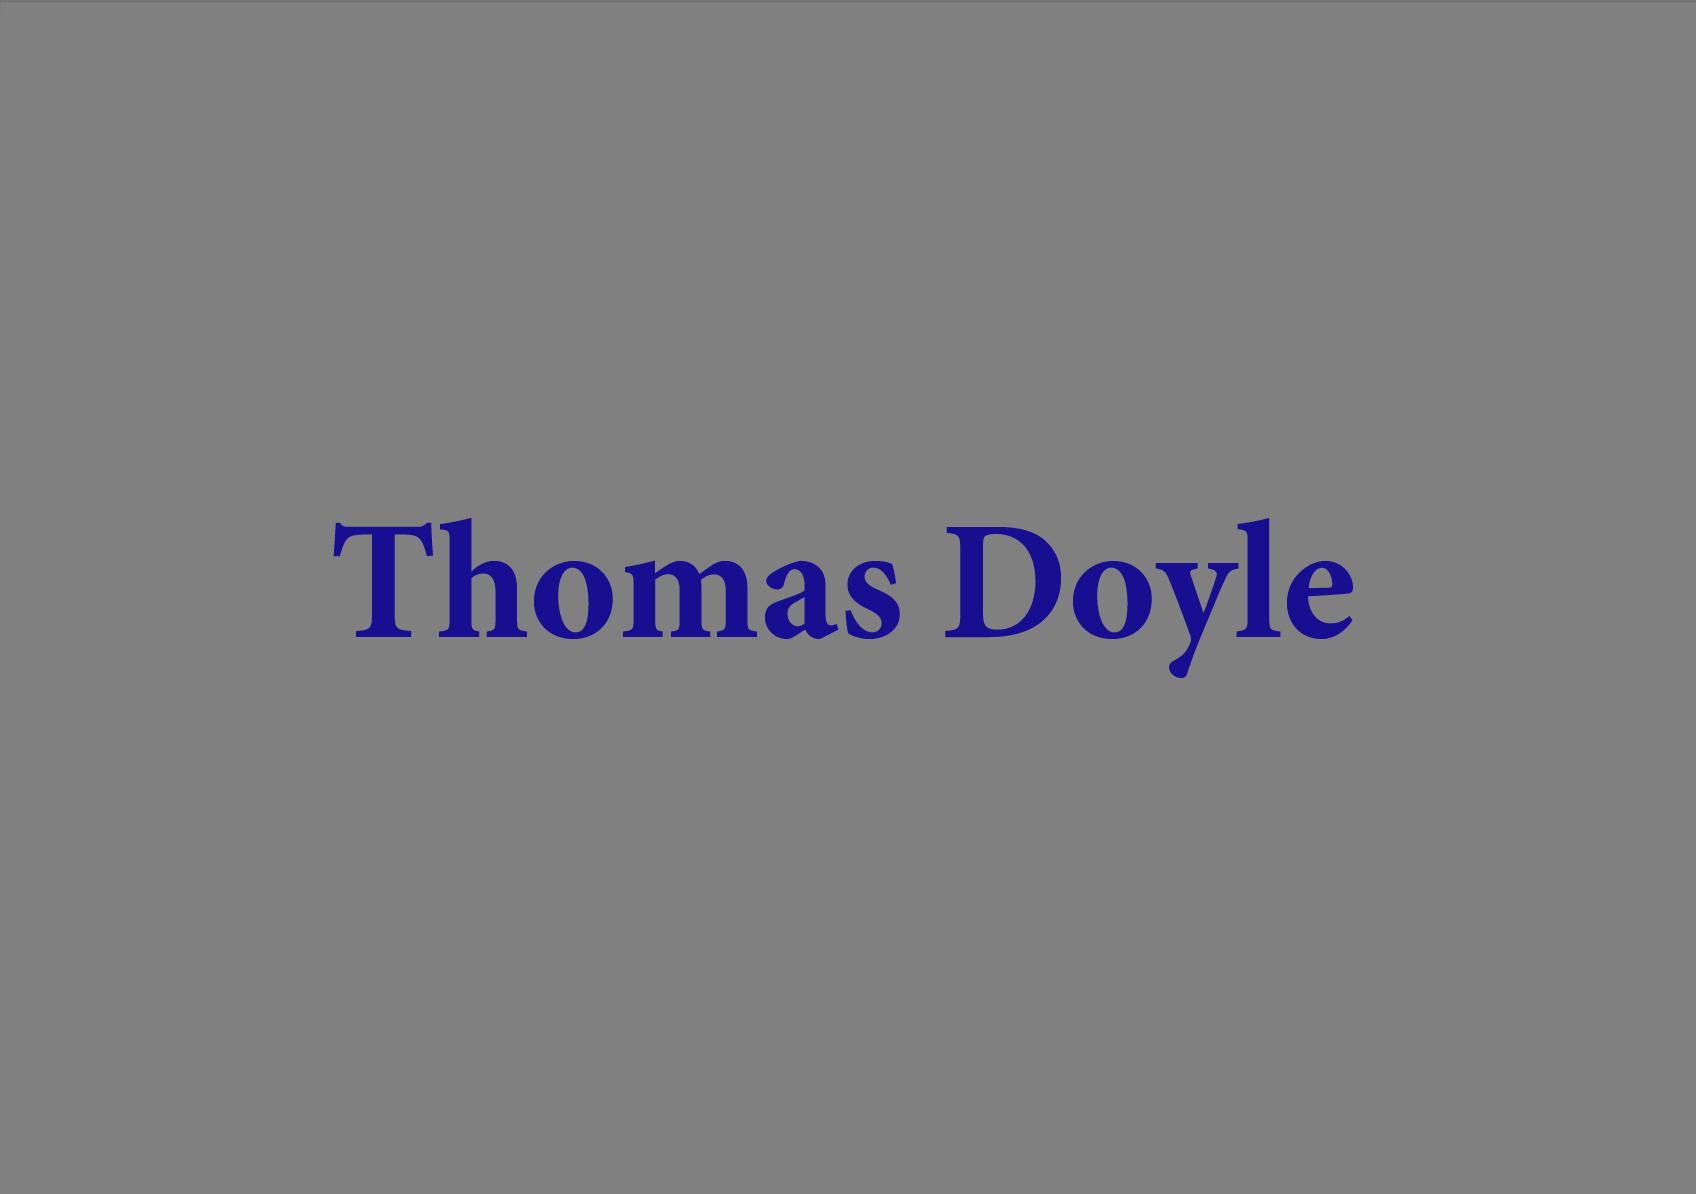 Thomas Doyle.png